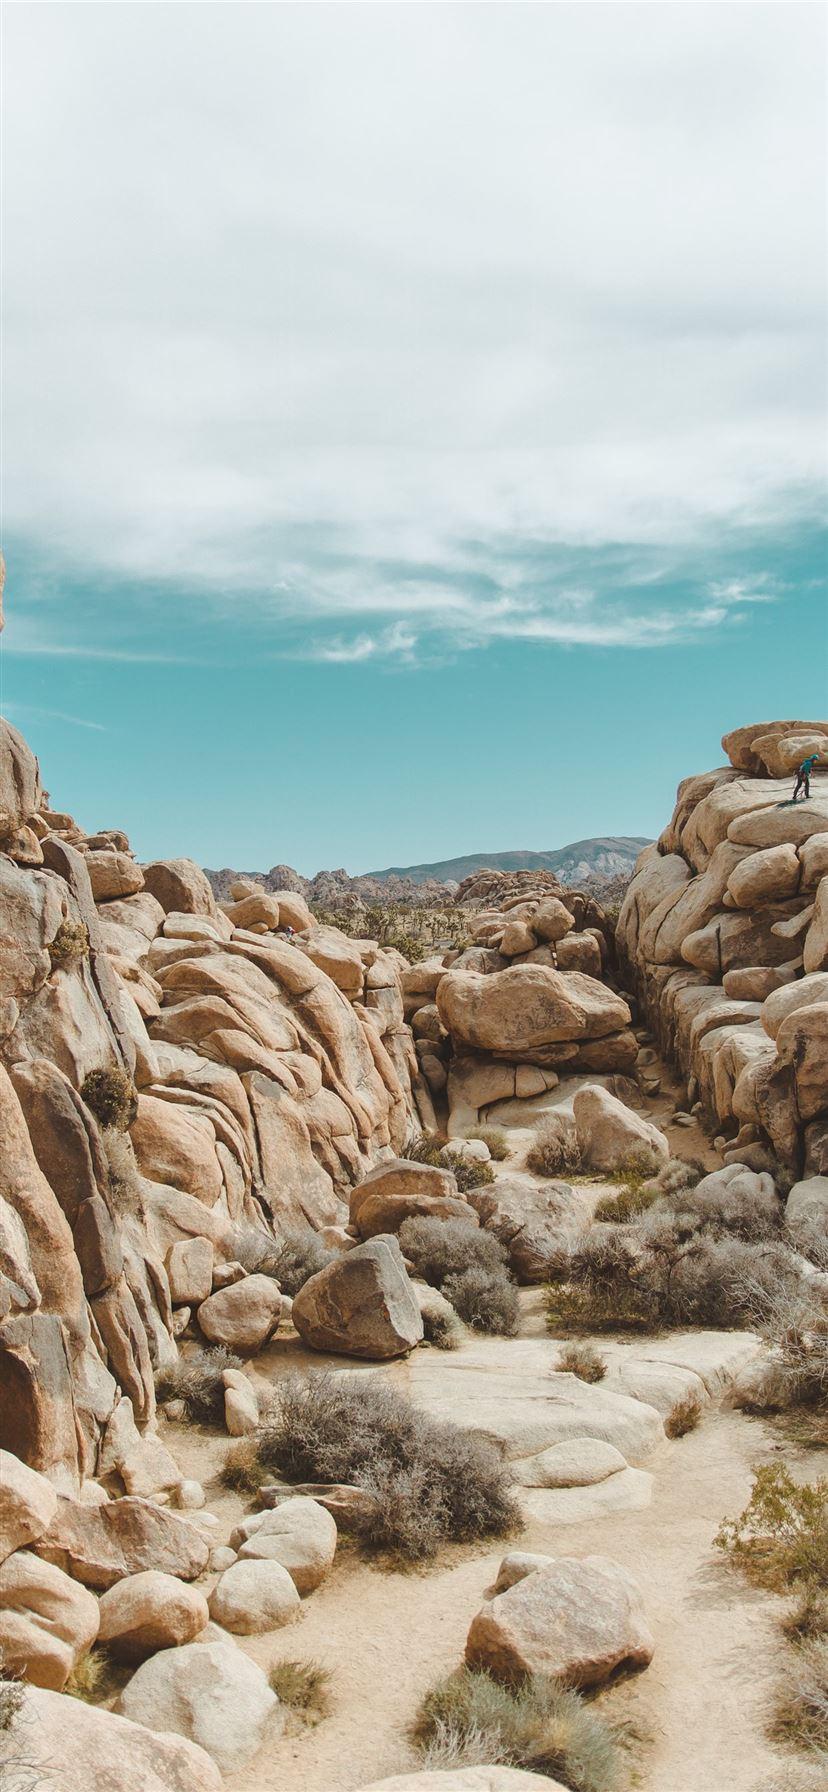 Best Joshua Tree National Park Iphone 11 Wallpapers Hd 2020 Ilikewallpaper